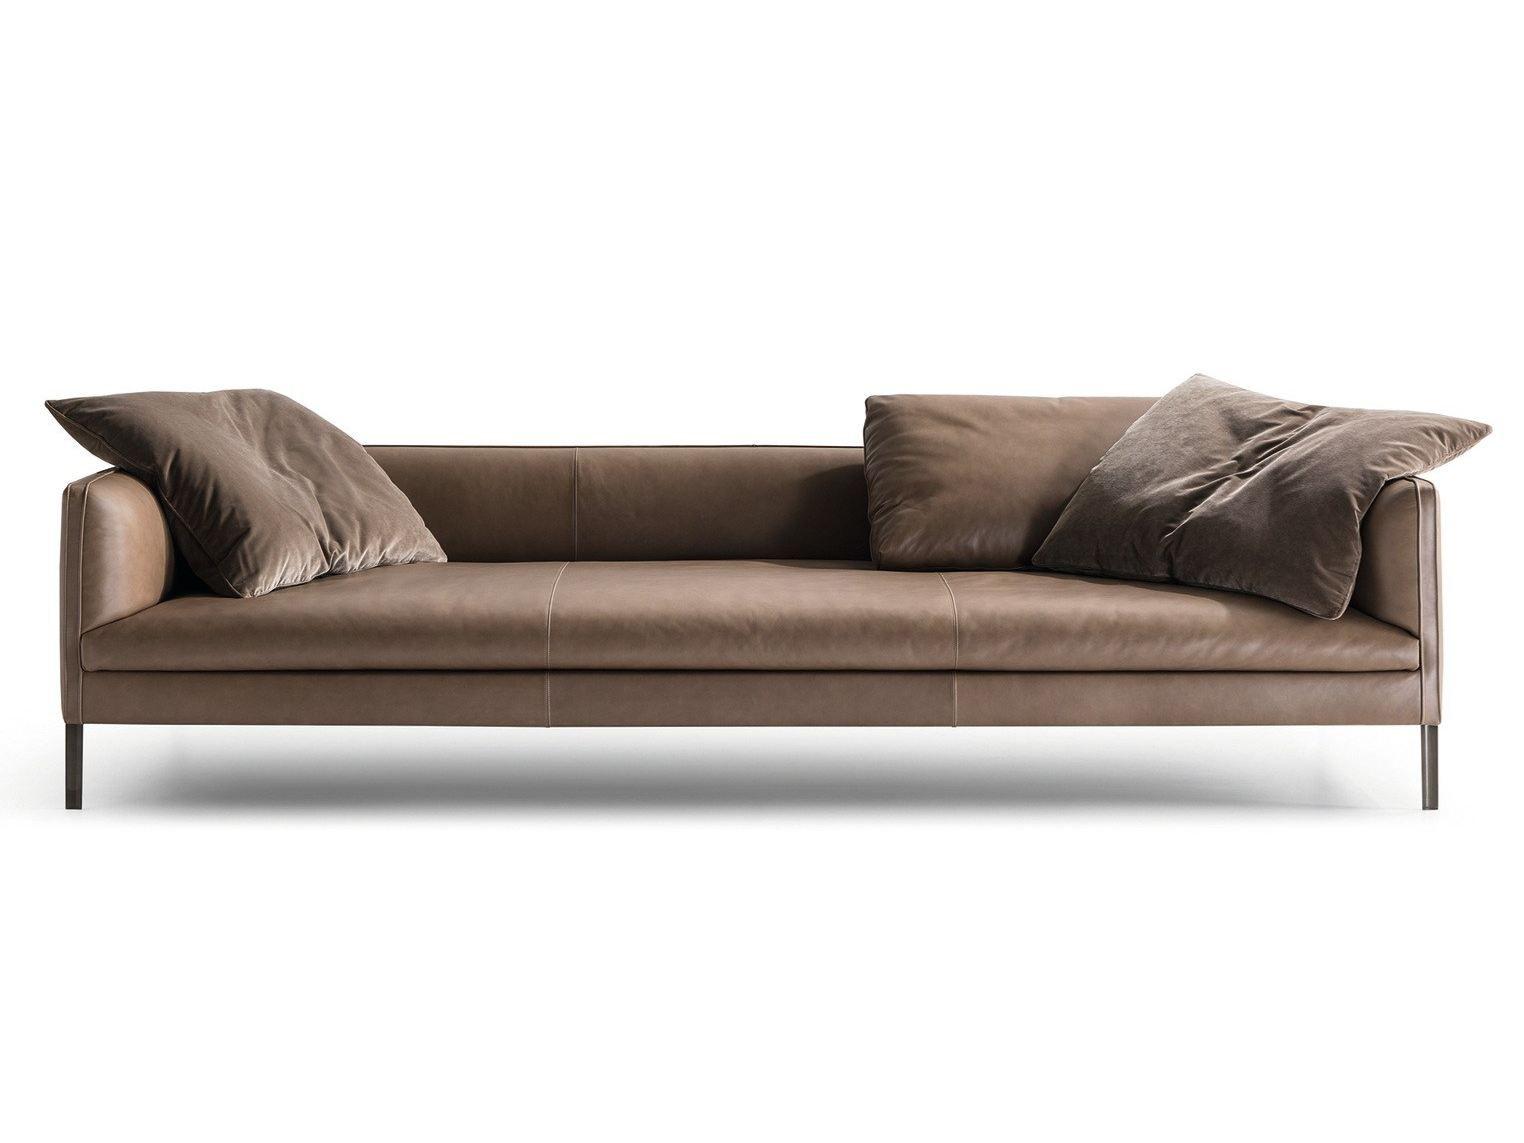 Paul divano by molteni c design vincent van duysen - Divano molteni paul ...